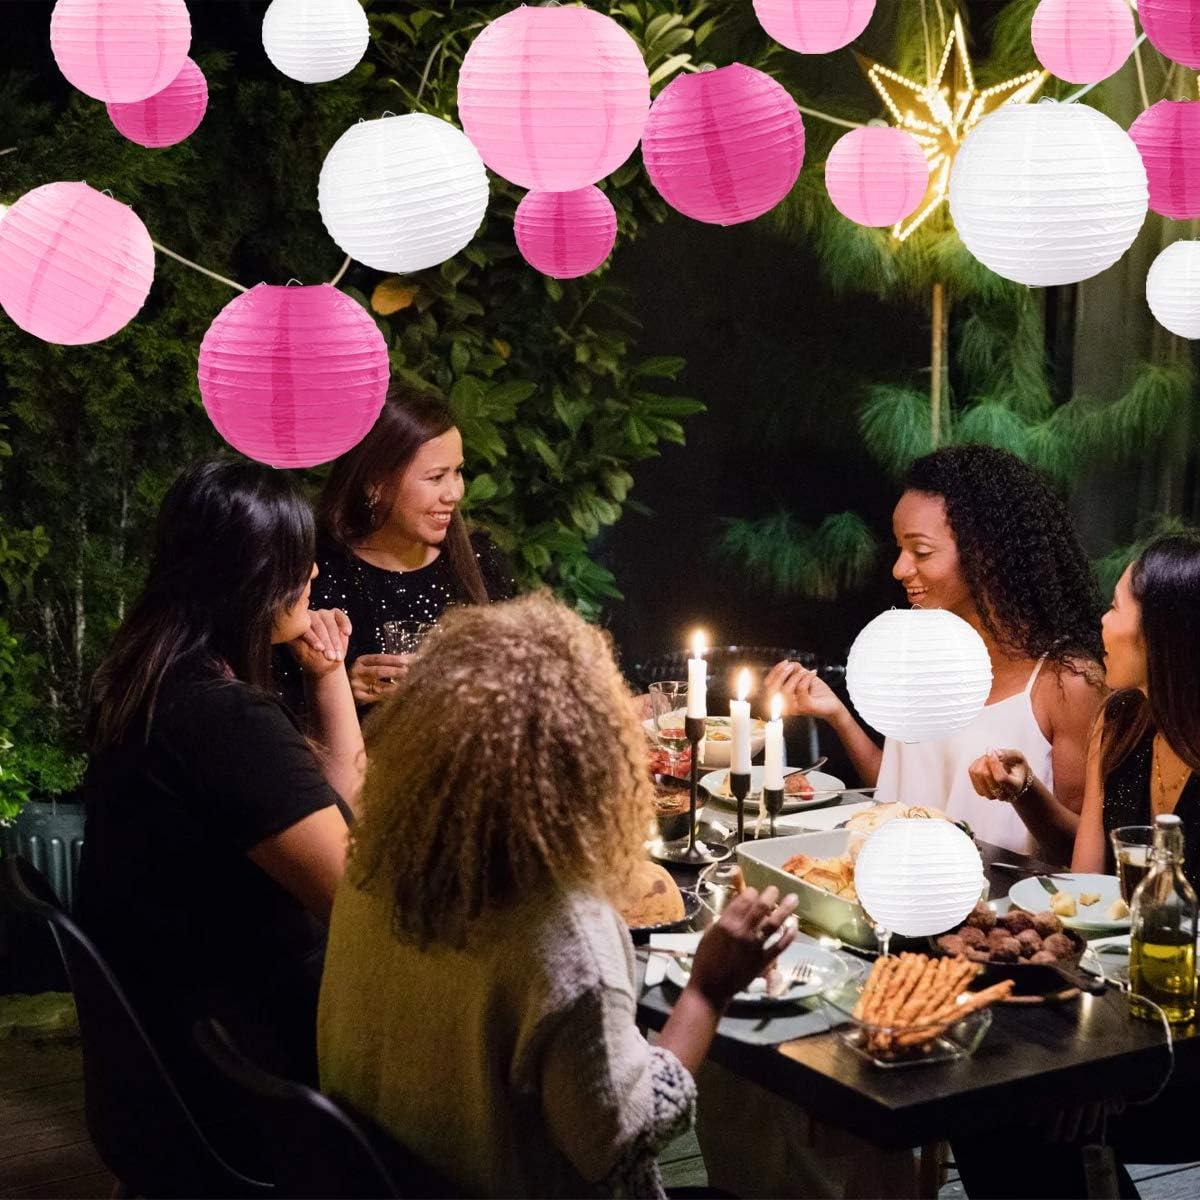 feste di nascita colore: Rosa Lanterne rotonde di carta per interni ed esterni 18 pezzi per compleanni Dudu matrimoni